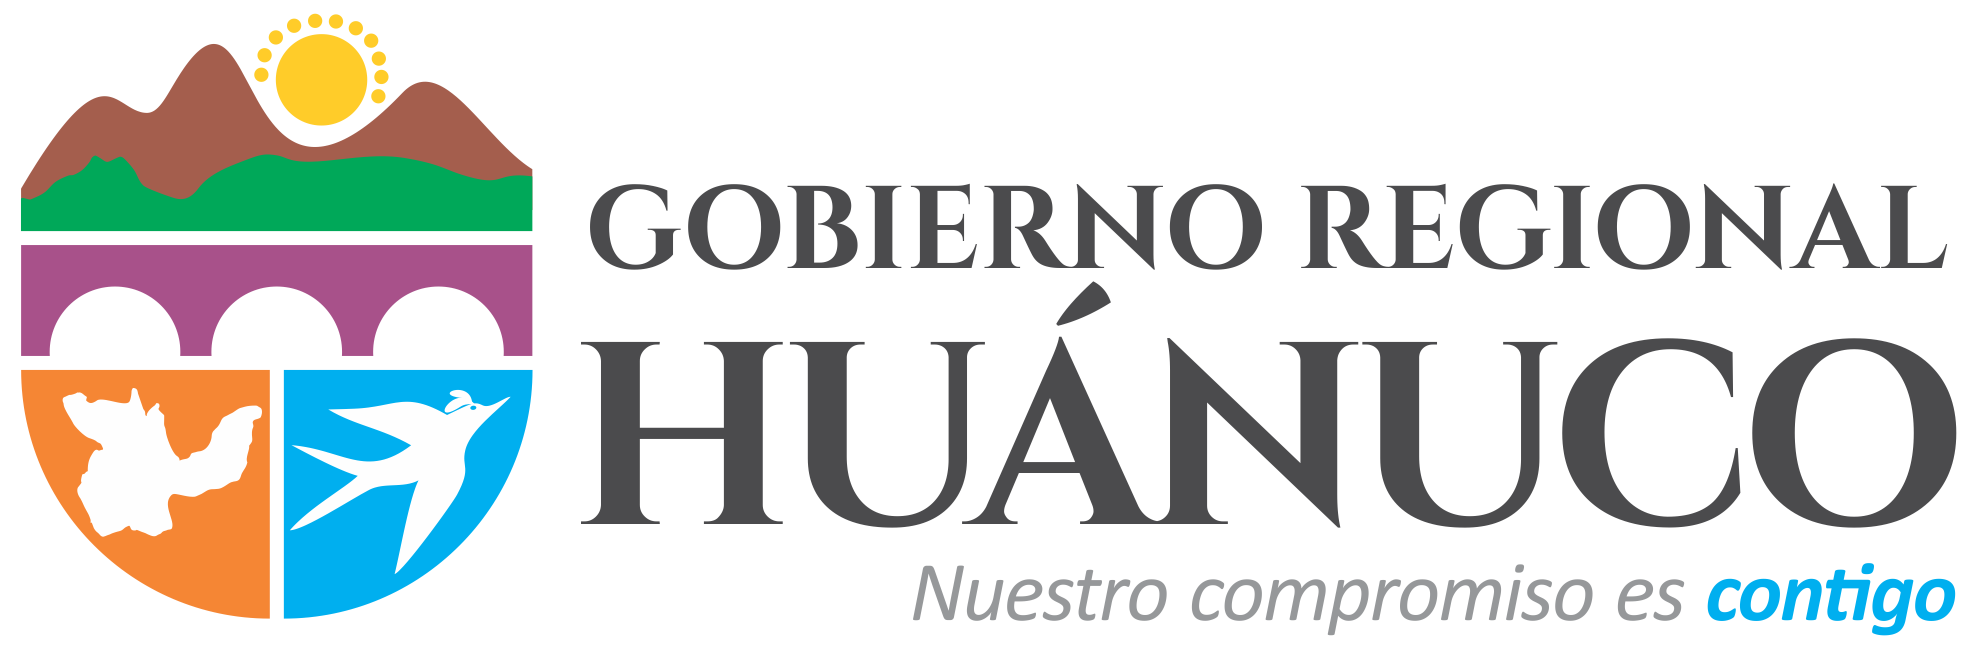 Gobierno Regional de Huánuco